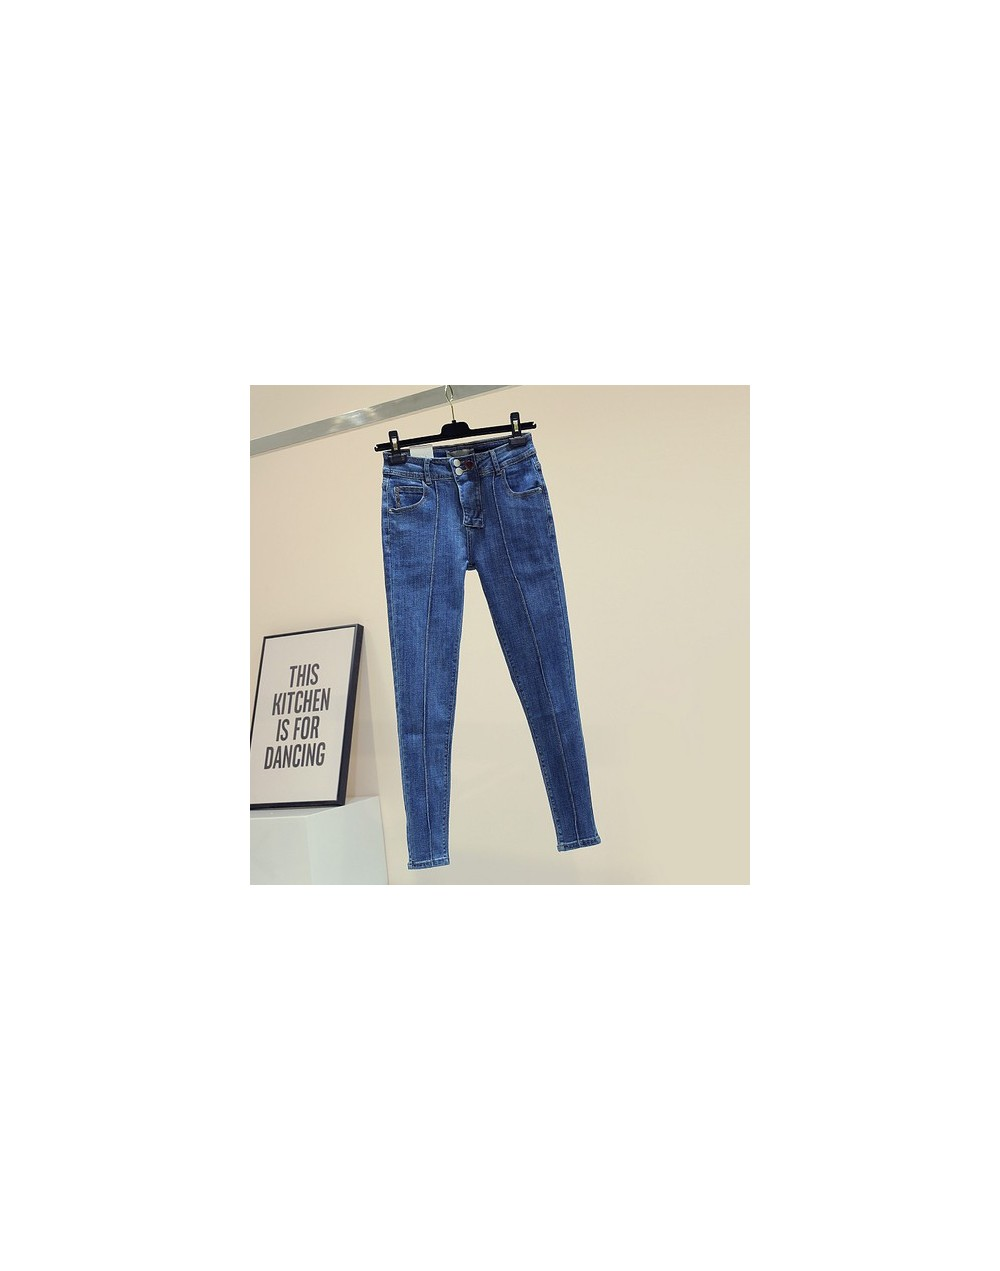 2019 Autumn Winter New New Slim Jeans High Waist Blue Denim Pants Ladies High Quality Stretch Jeans Pencil Pants Trousers - ...